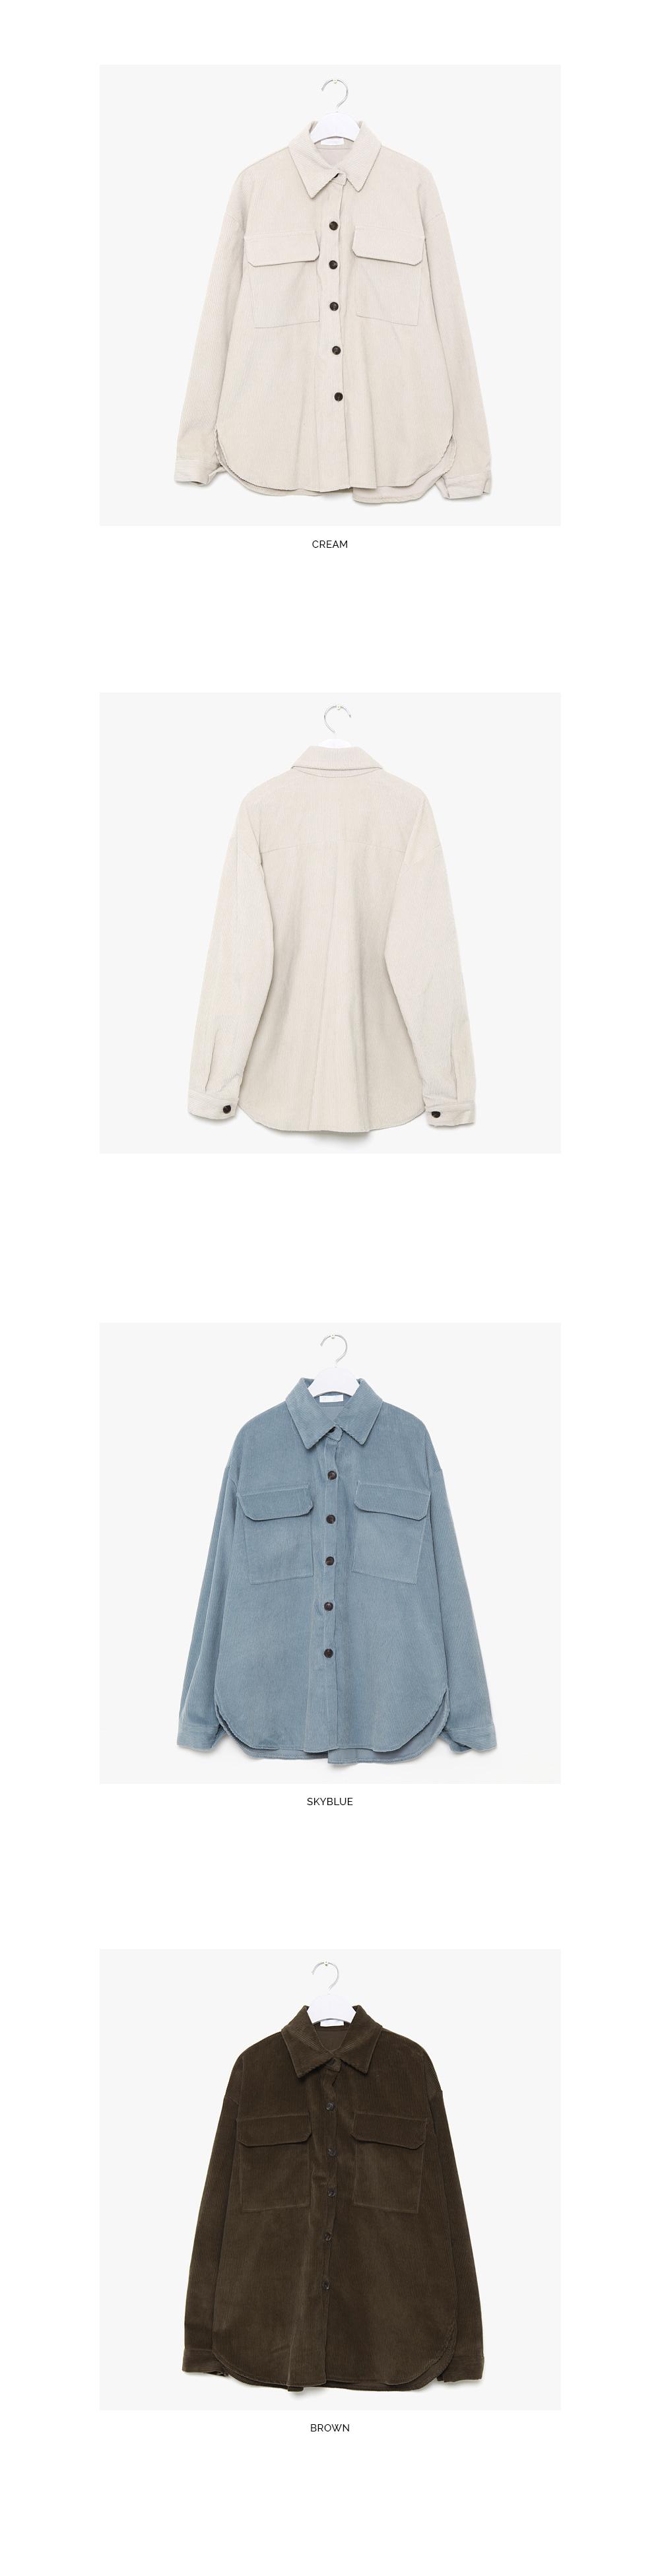 ono corduroy overfit shirts